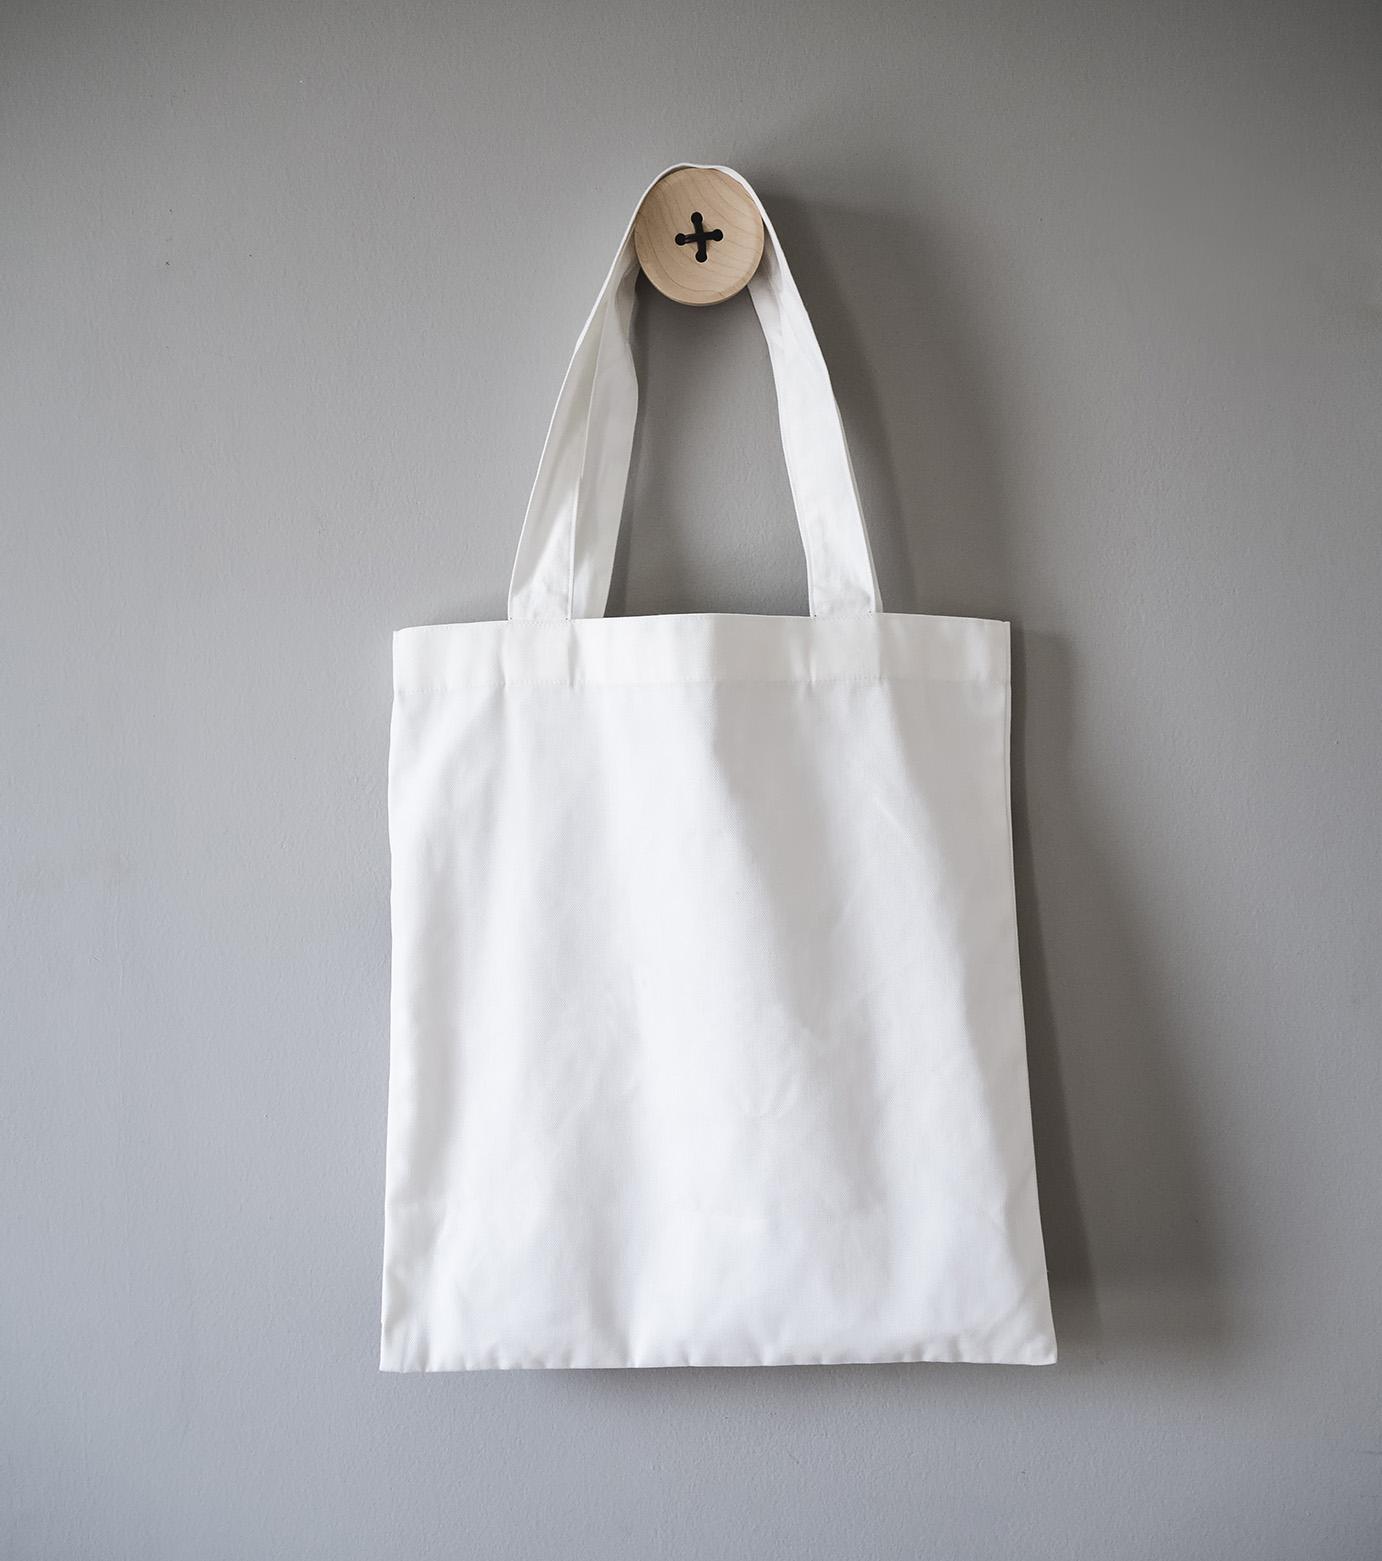 Bespoke Screen Printed Cotton Tote Bag